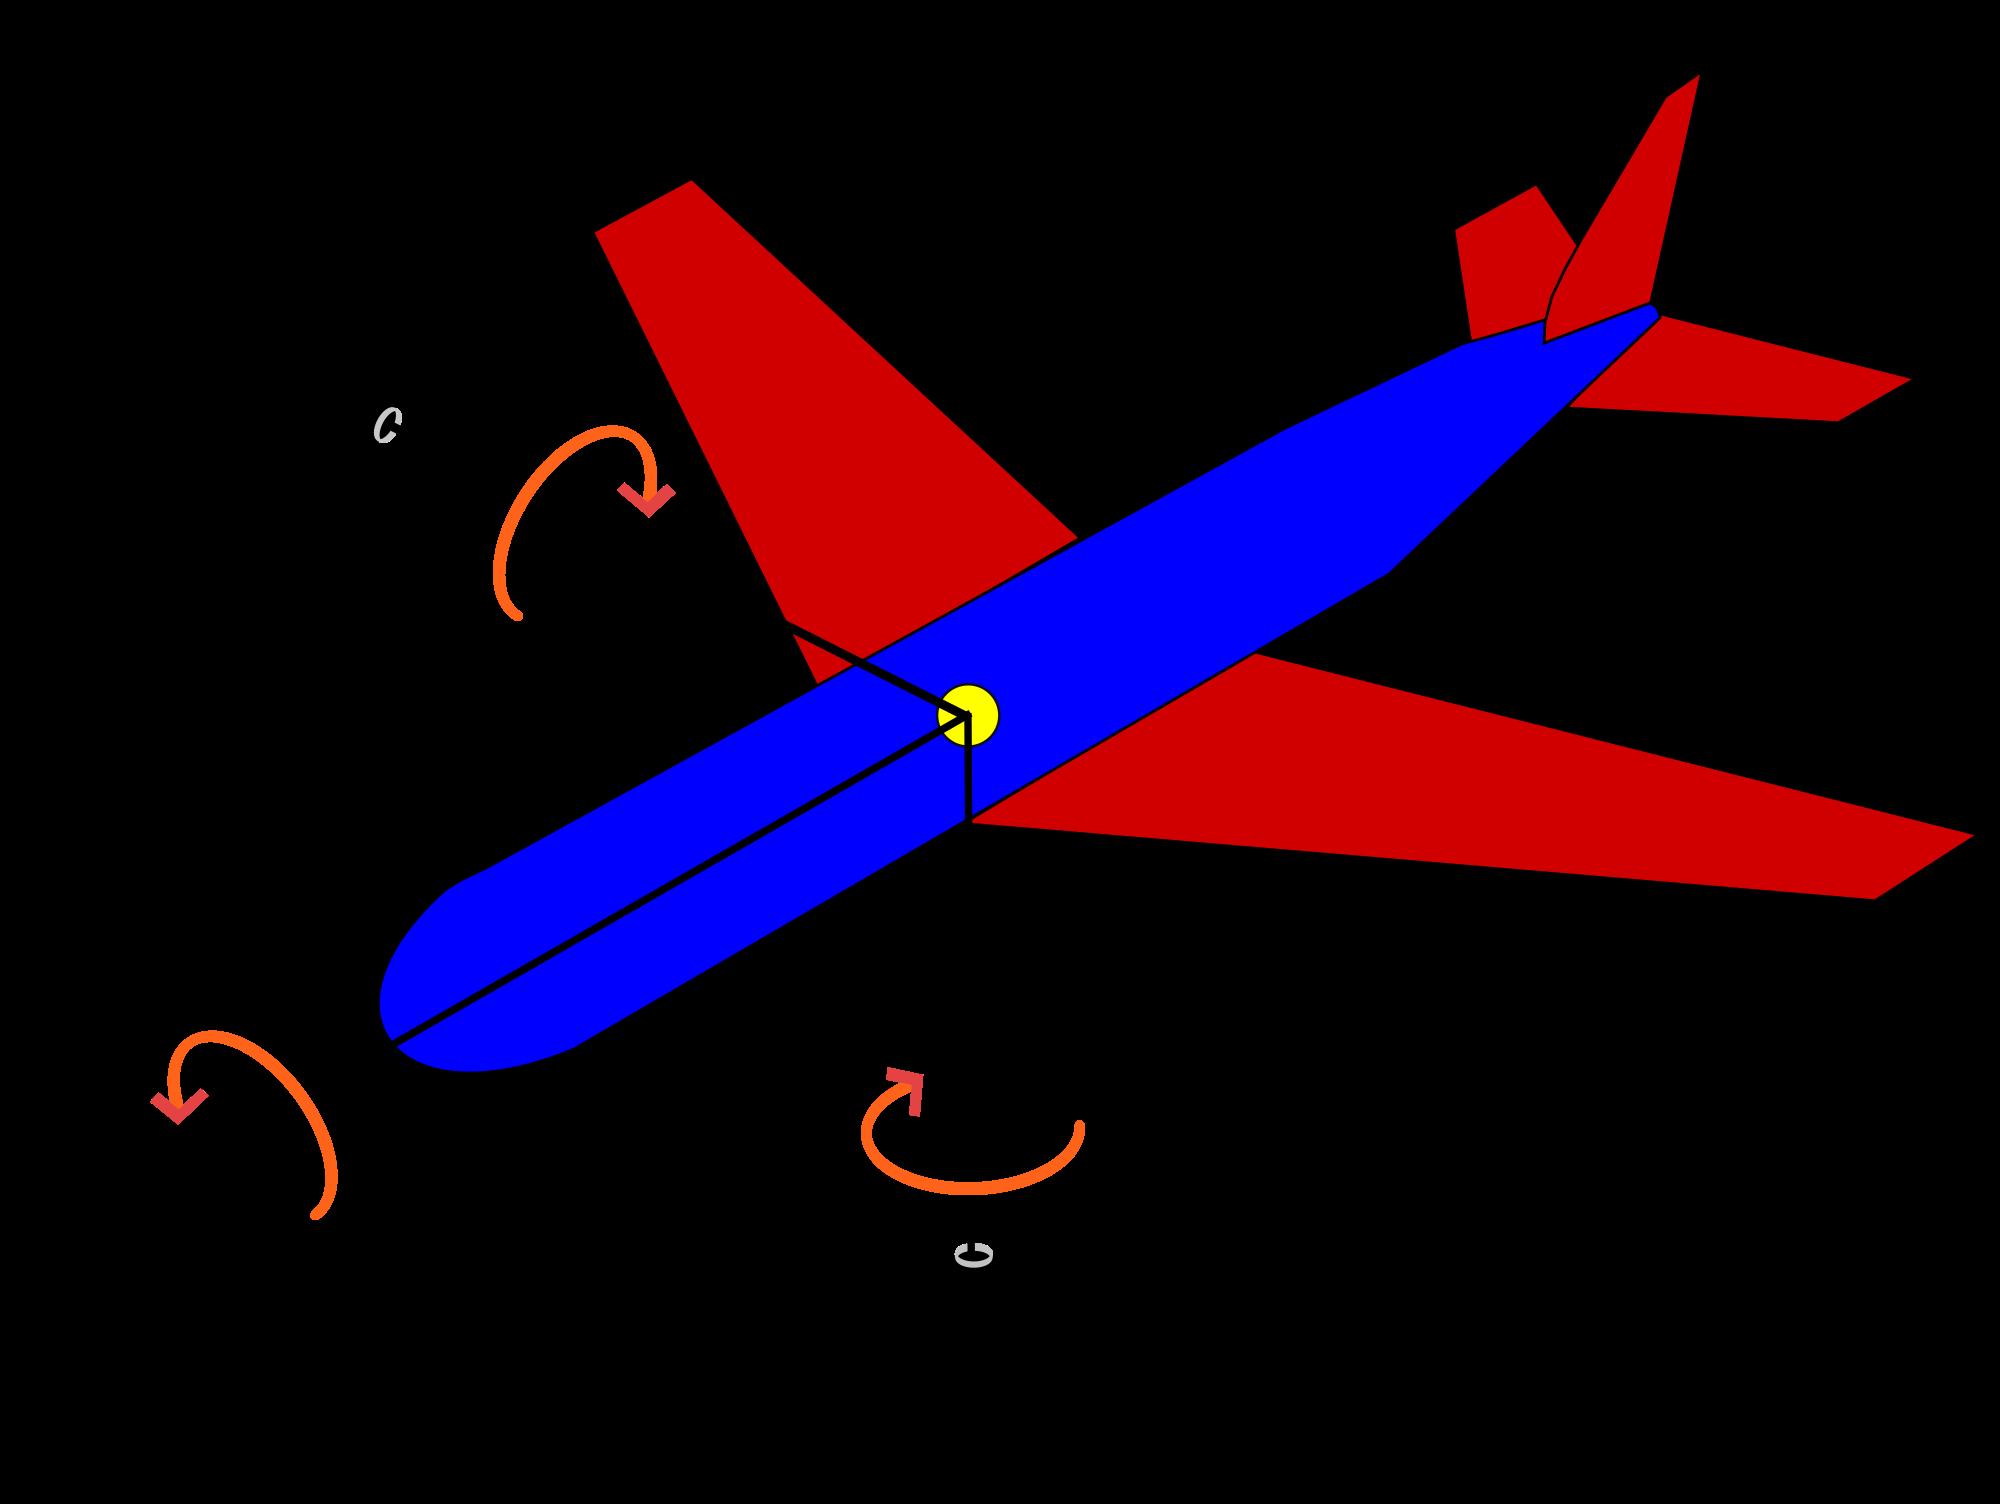 Yaw plane clipart.